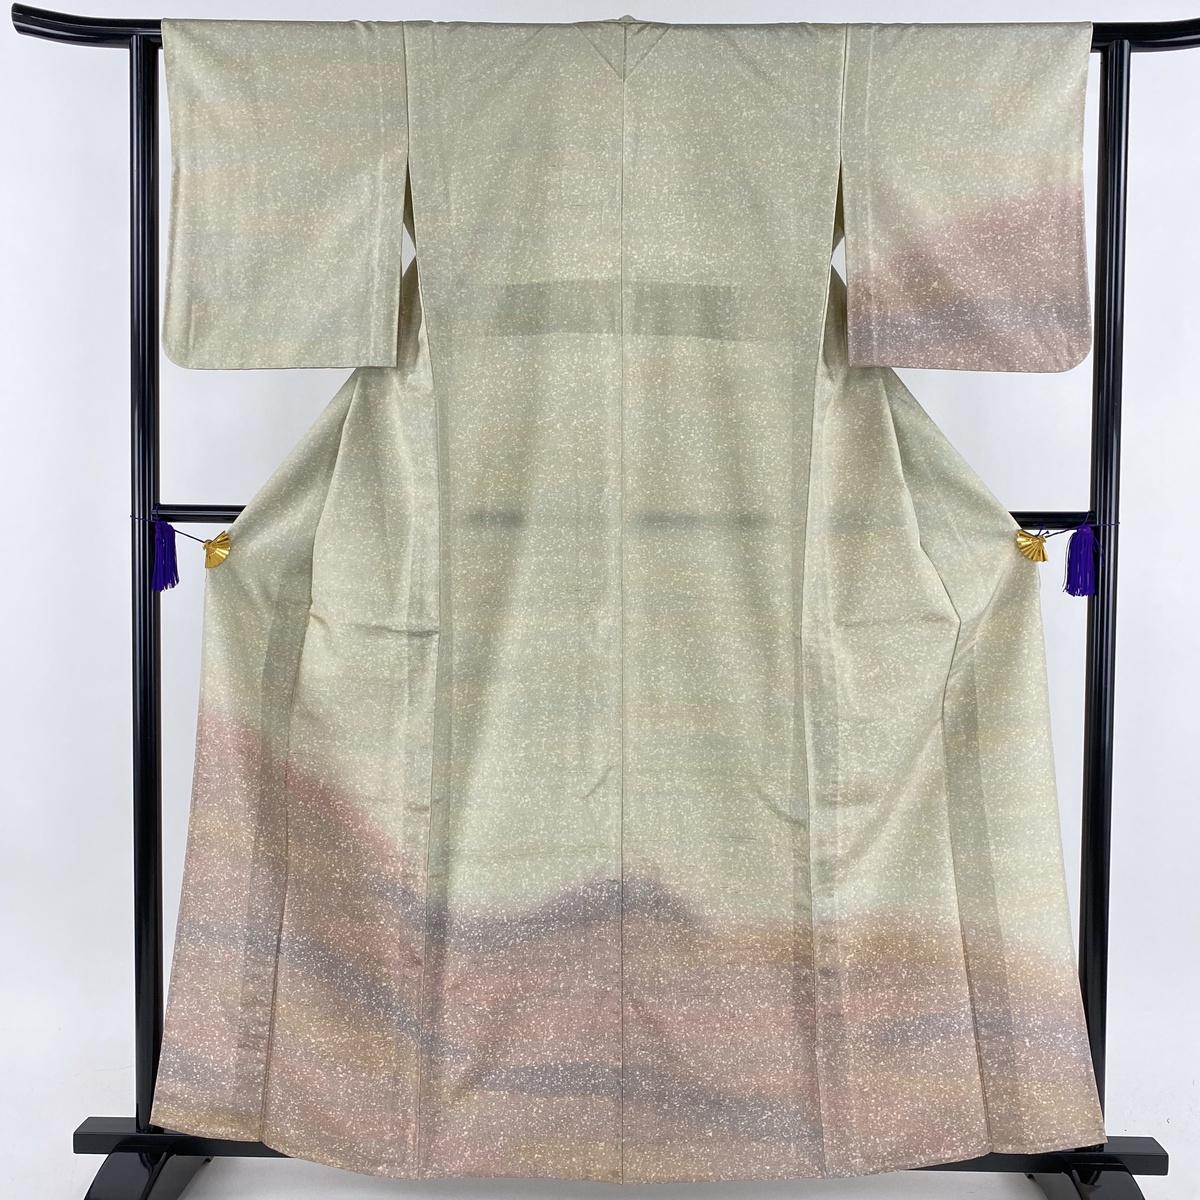 訪問着 美品 名品 紬地 ぼかし 薄緑 単衣 身丈160cm 裄丈62.5cm S 正絹 【中古】